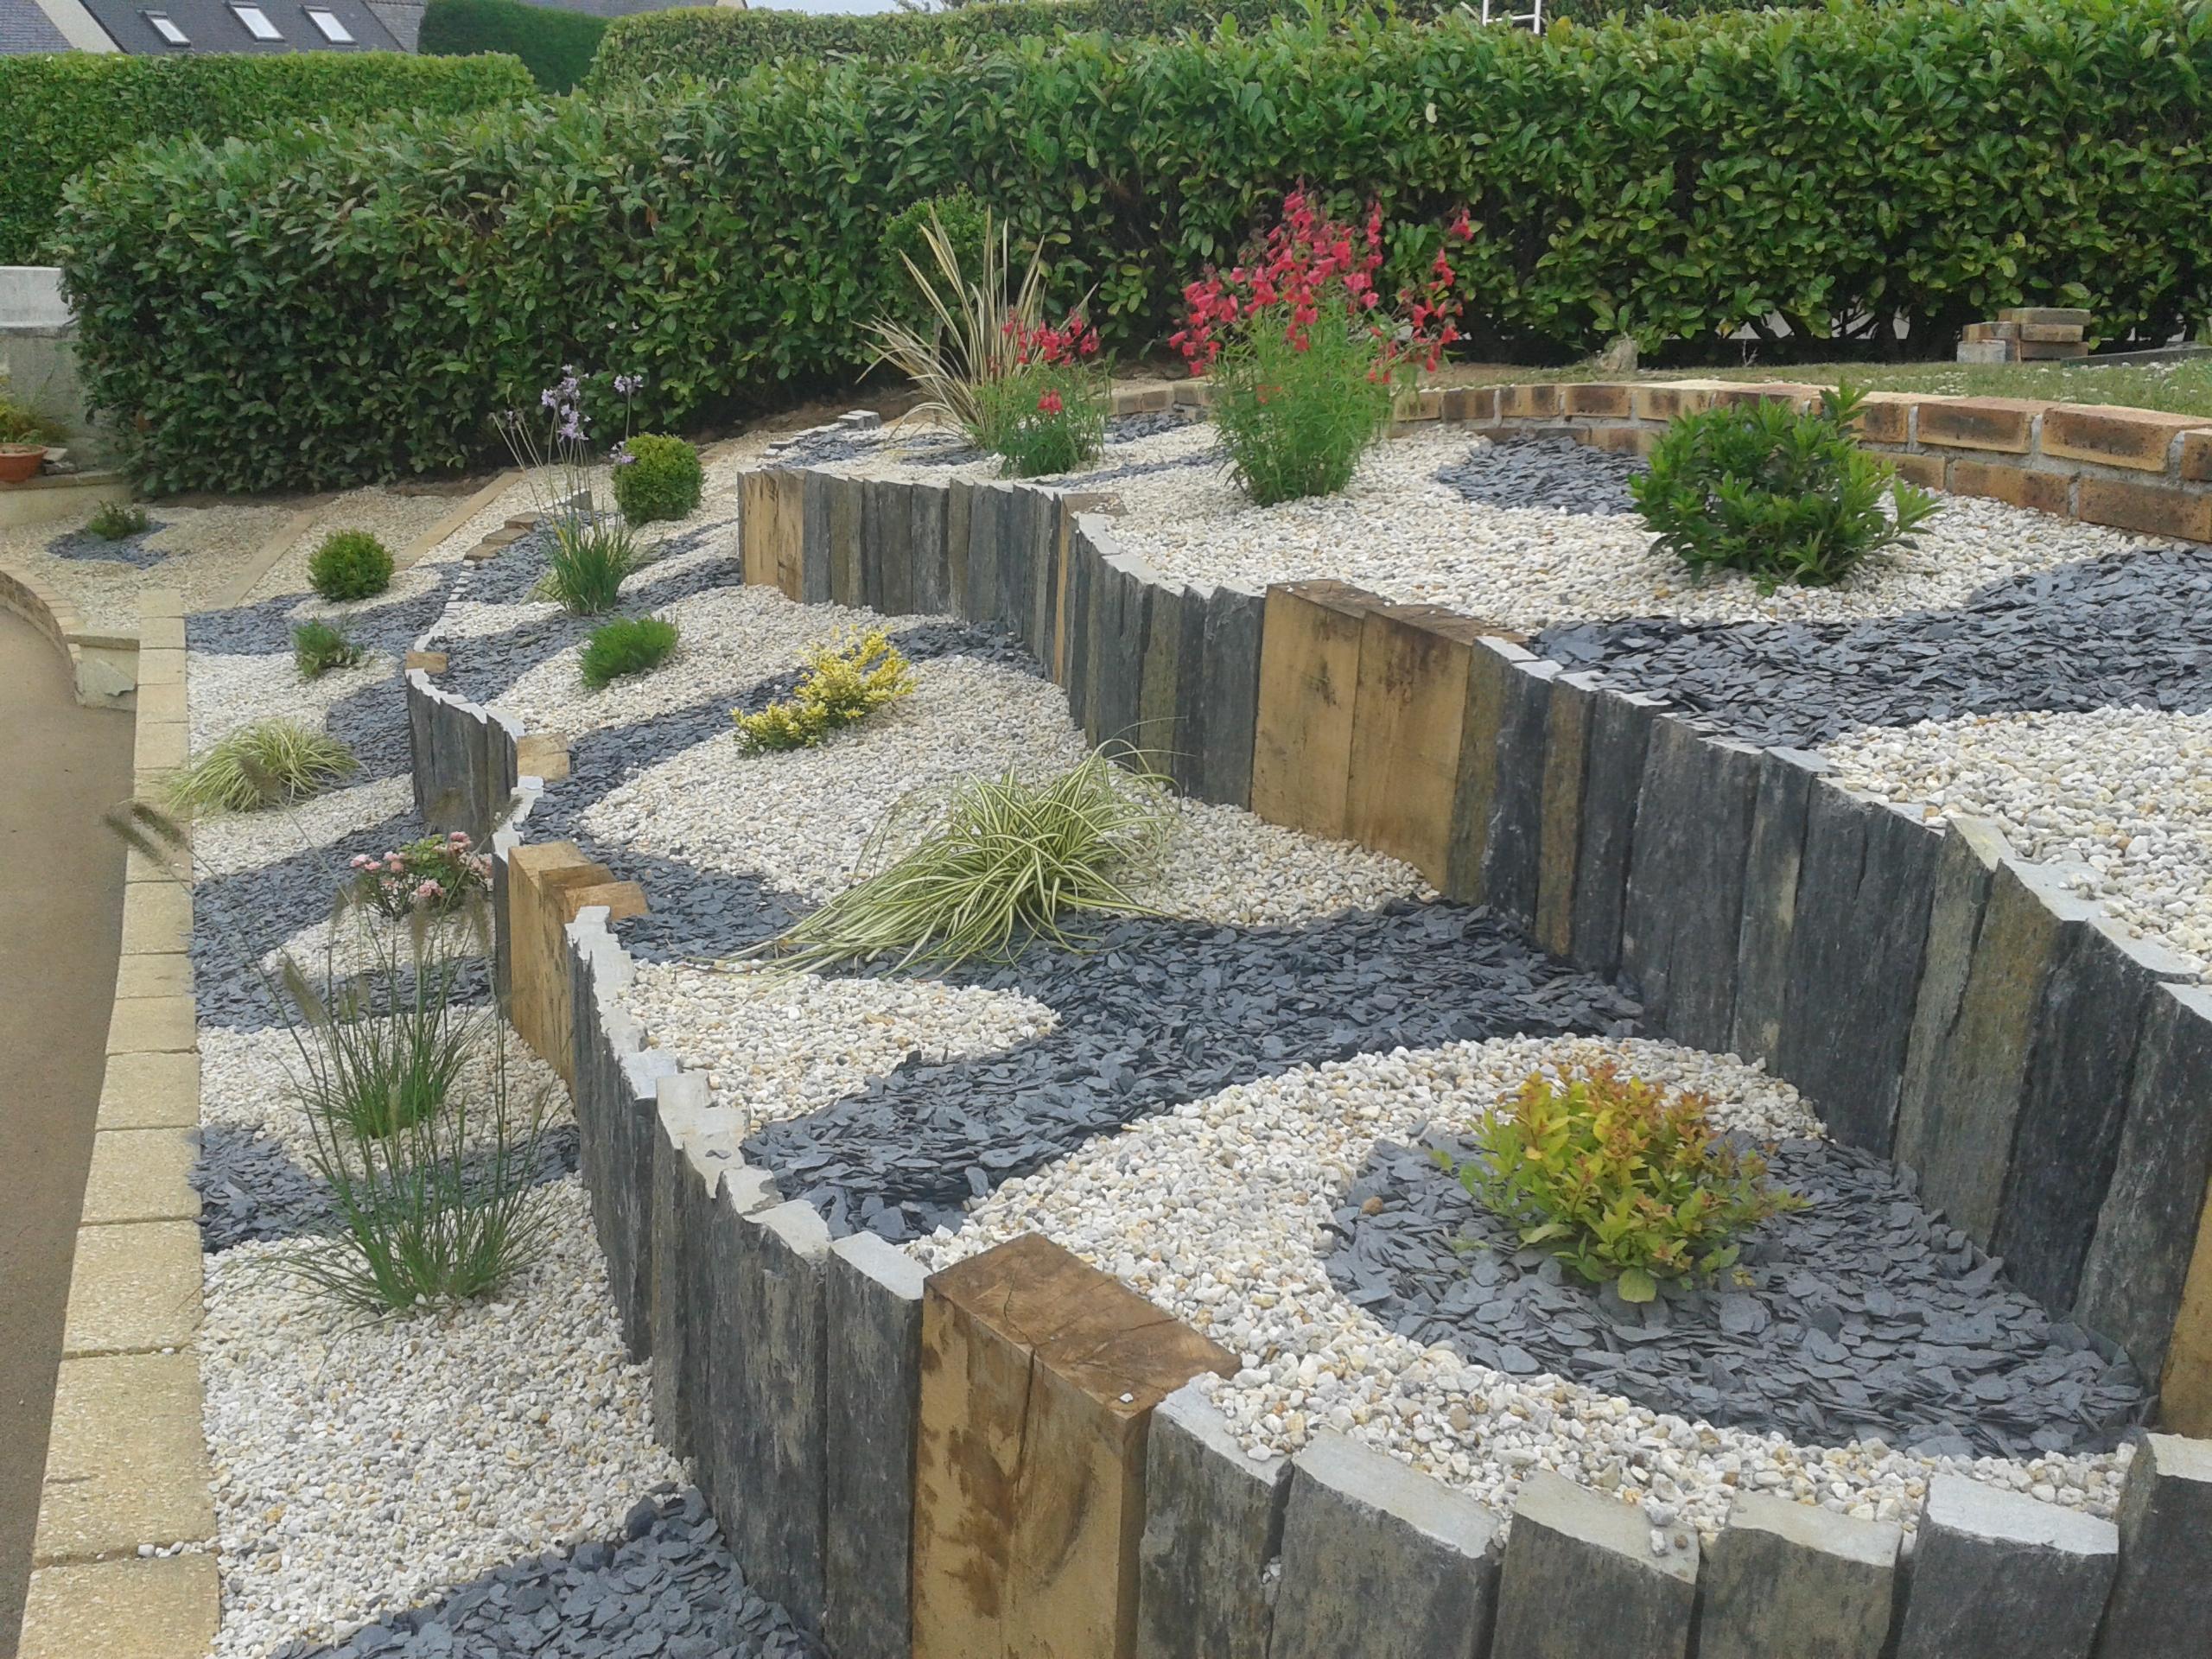 Couleur jardin for Amenagement jardin ardoise